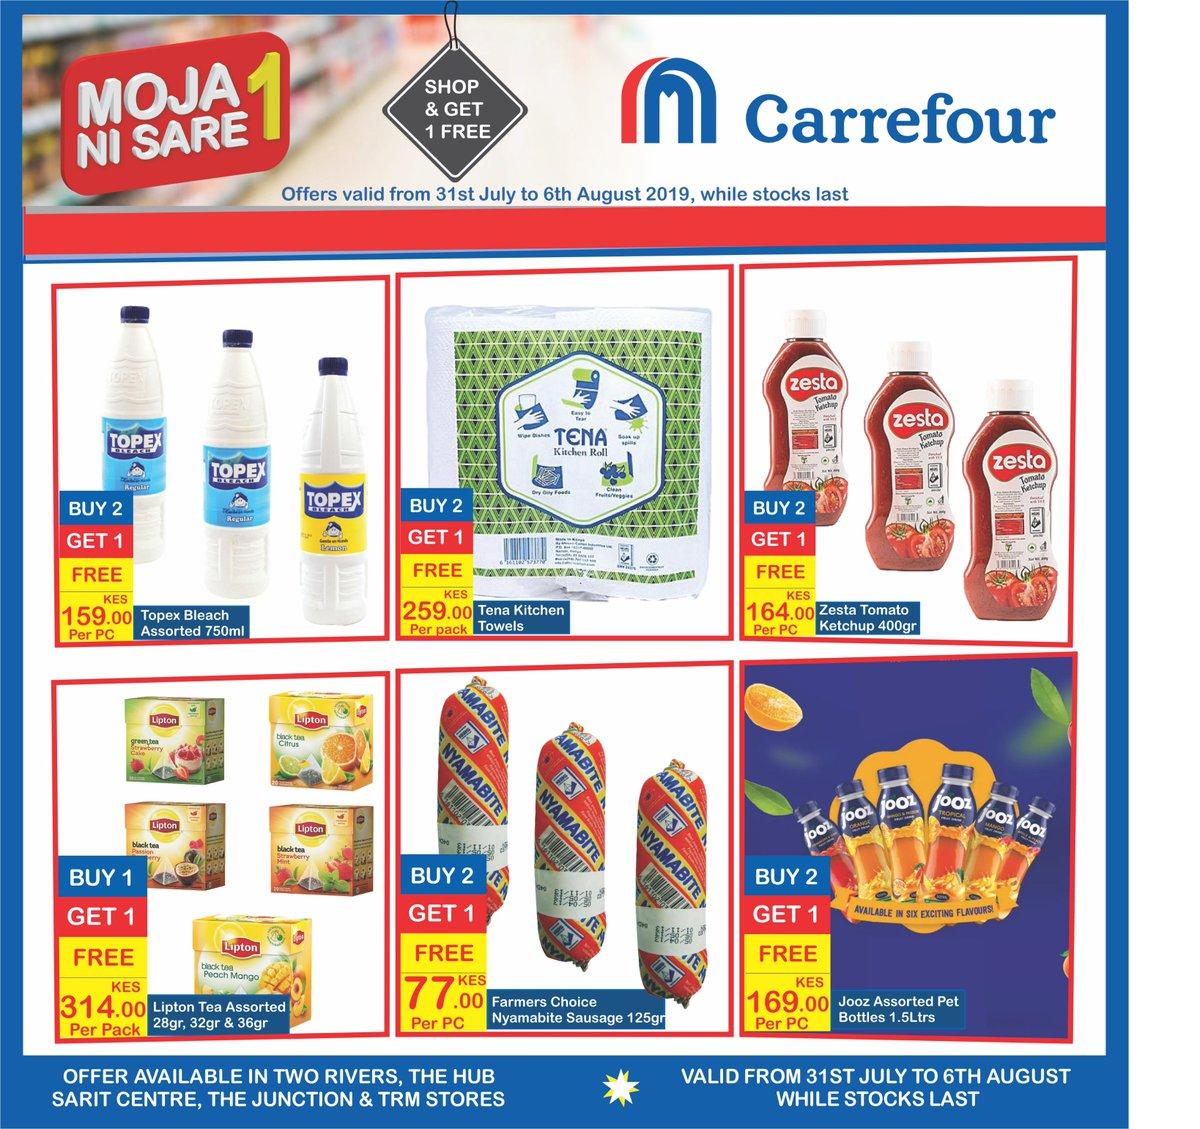 Carrefour Kenya Carrefourke Twitter